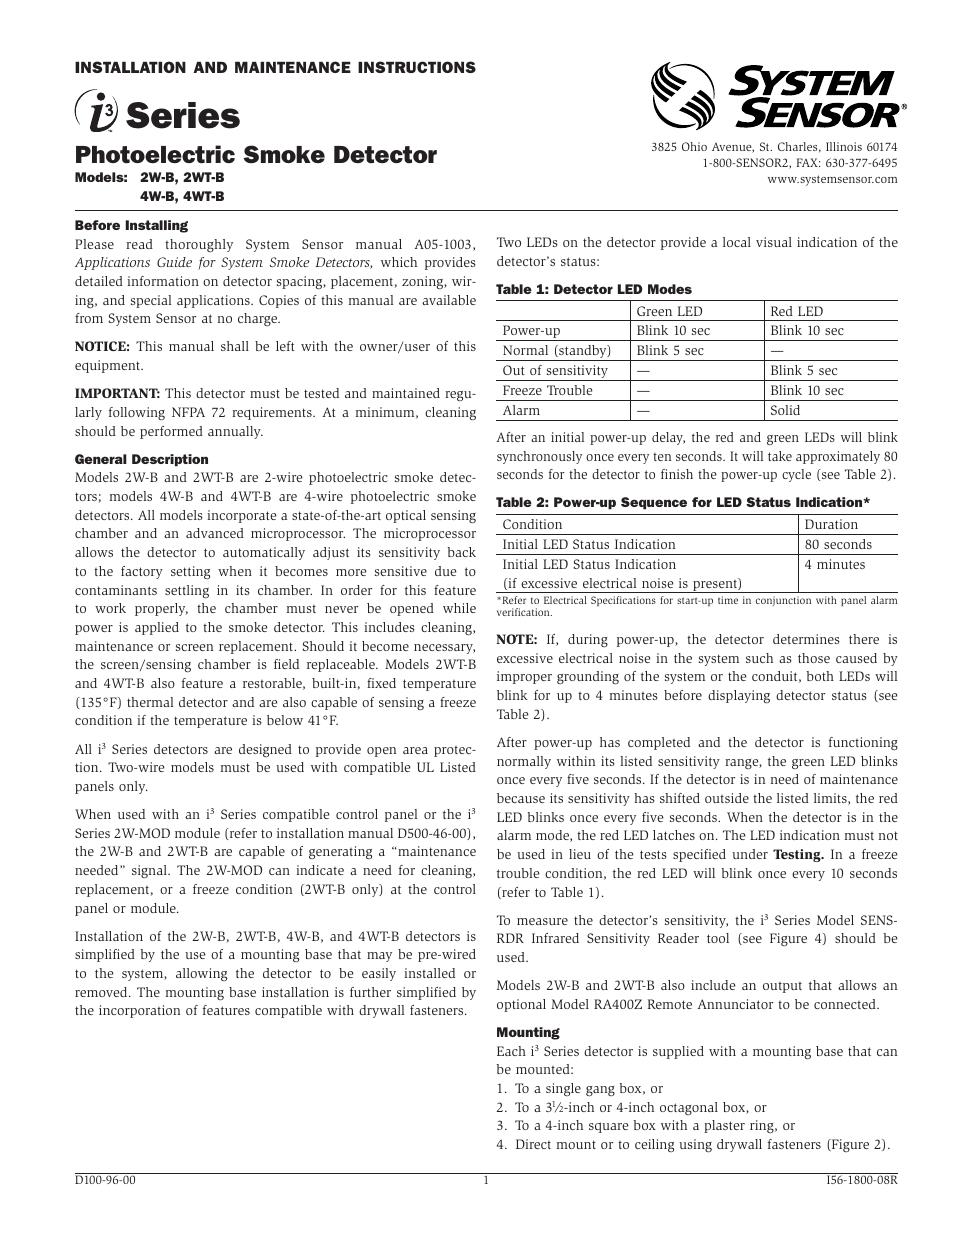 Thermocouple Sensor Manual Guide